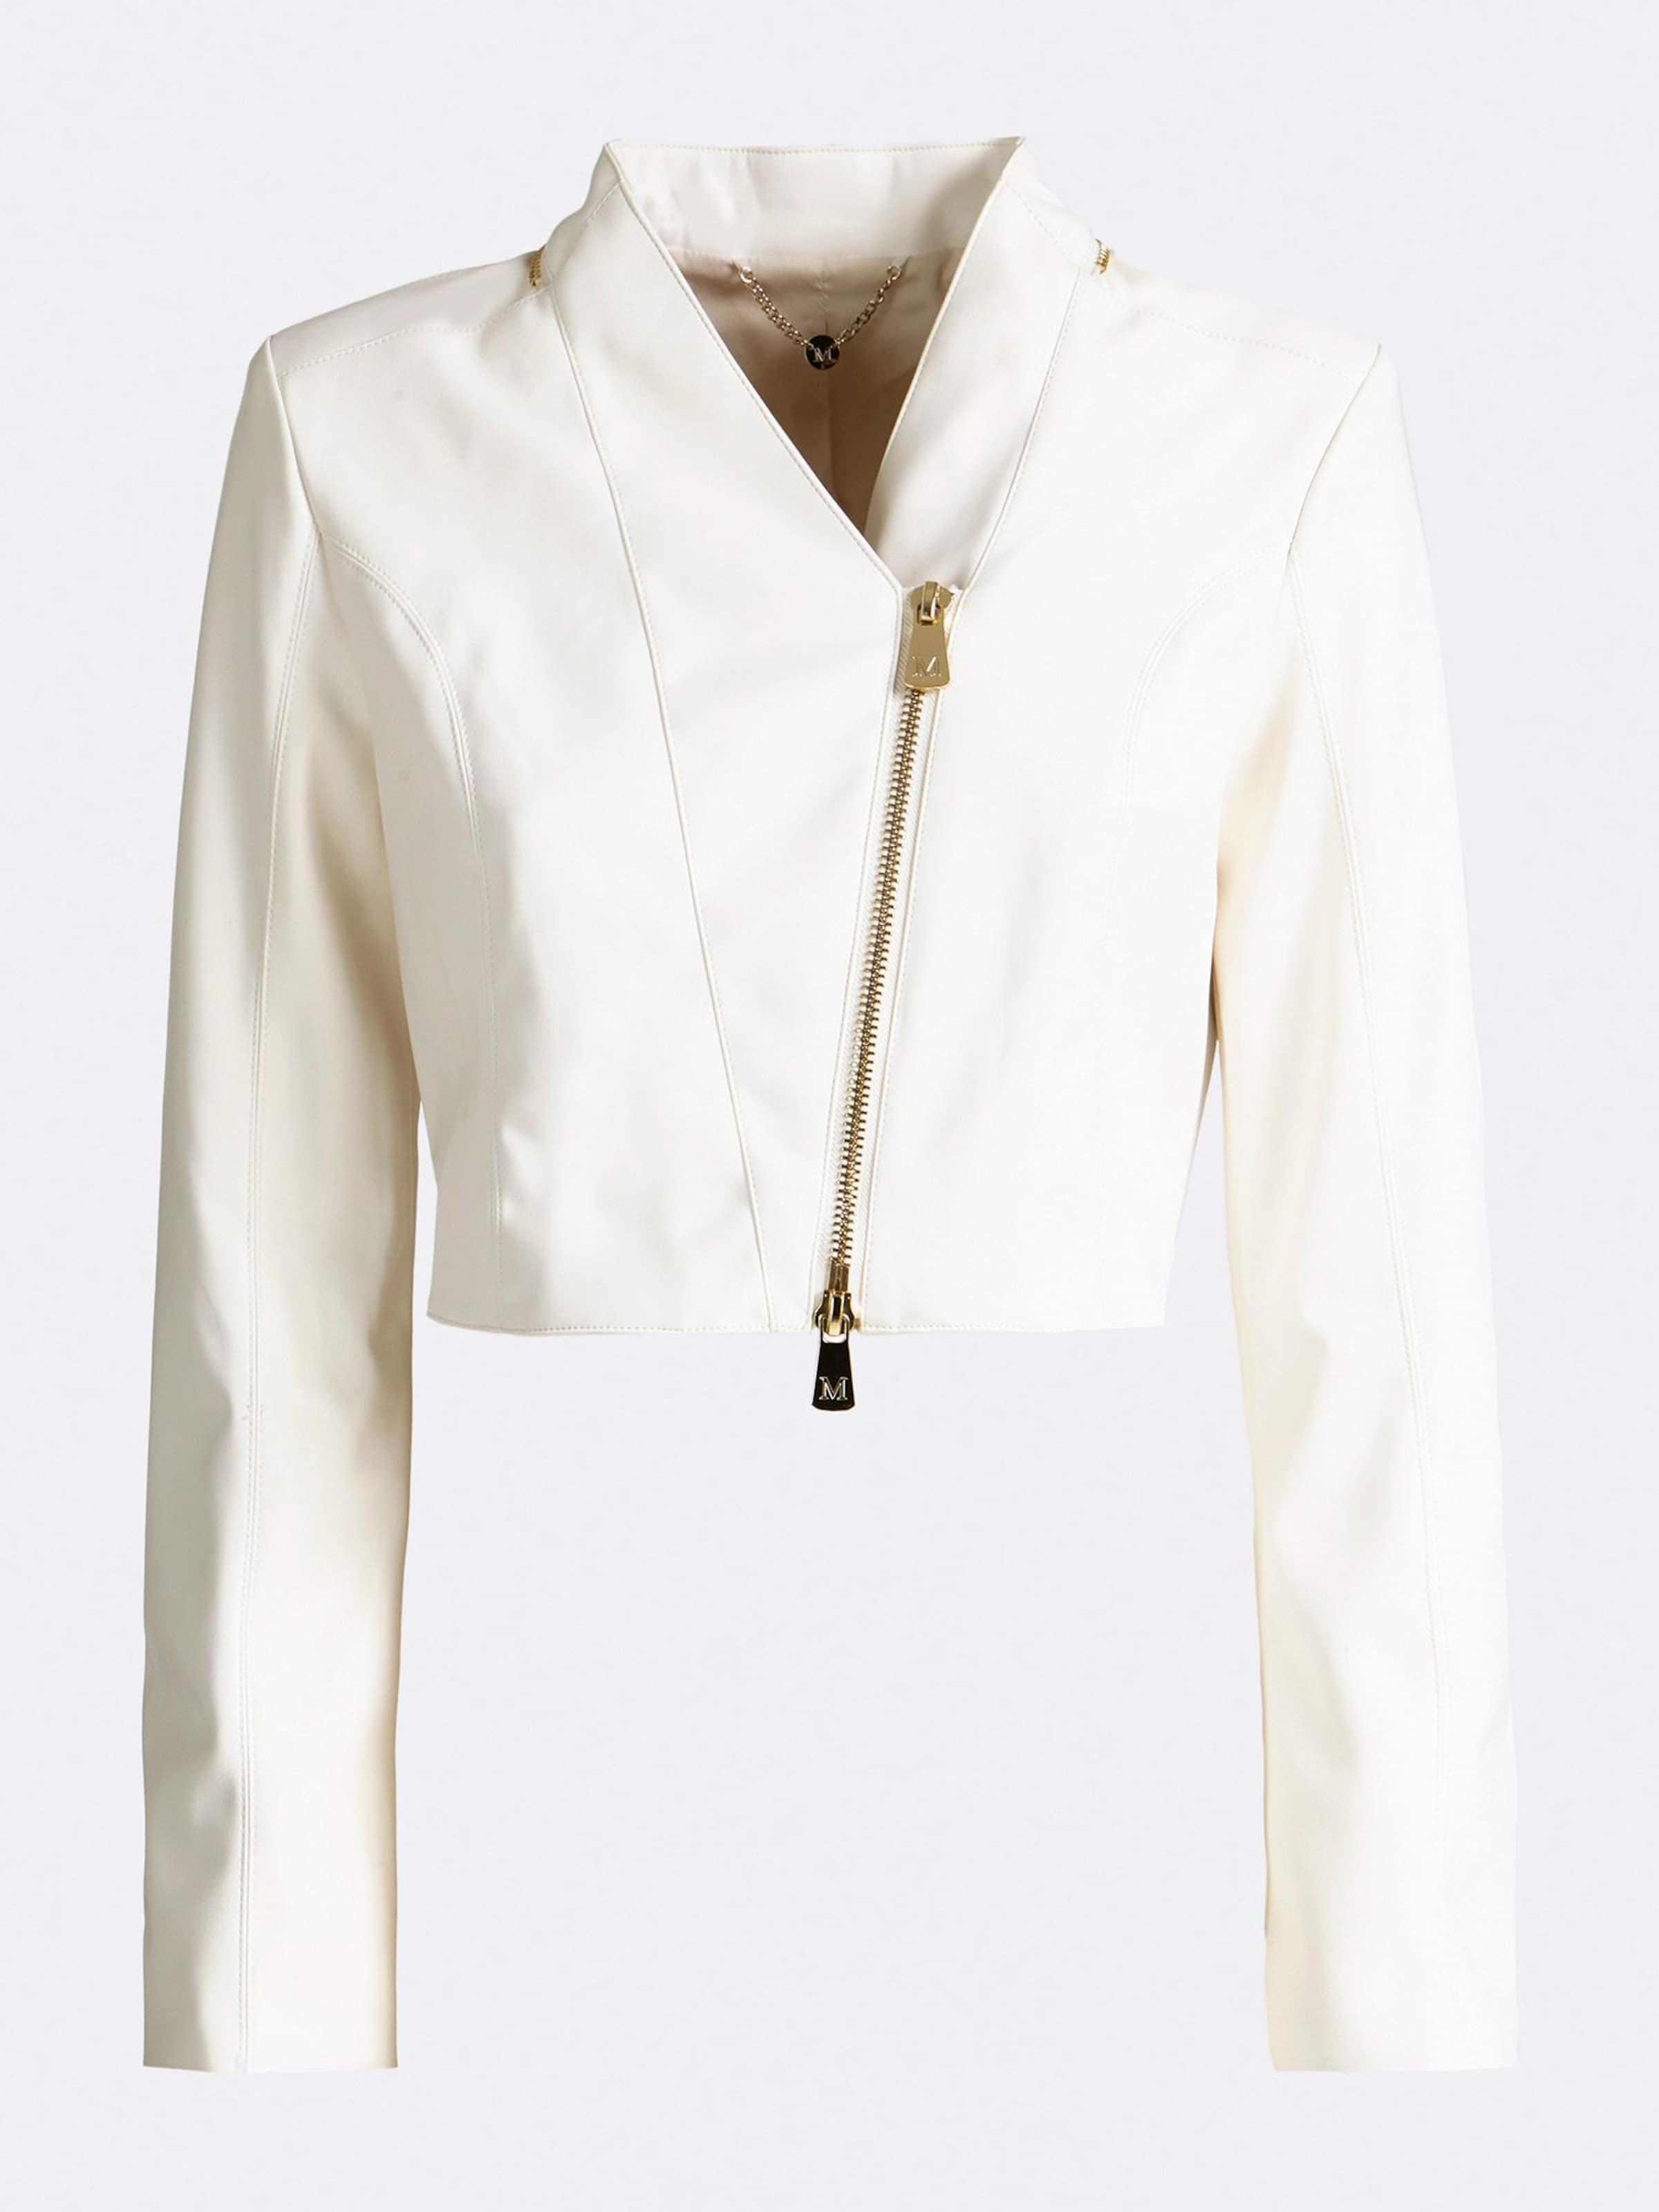 Jacke Angeles Los Marciano 'marciano' Weiß In WYD9e2IEH